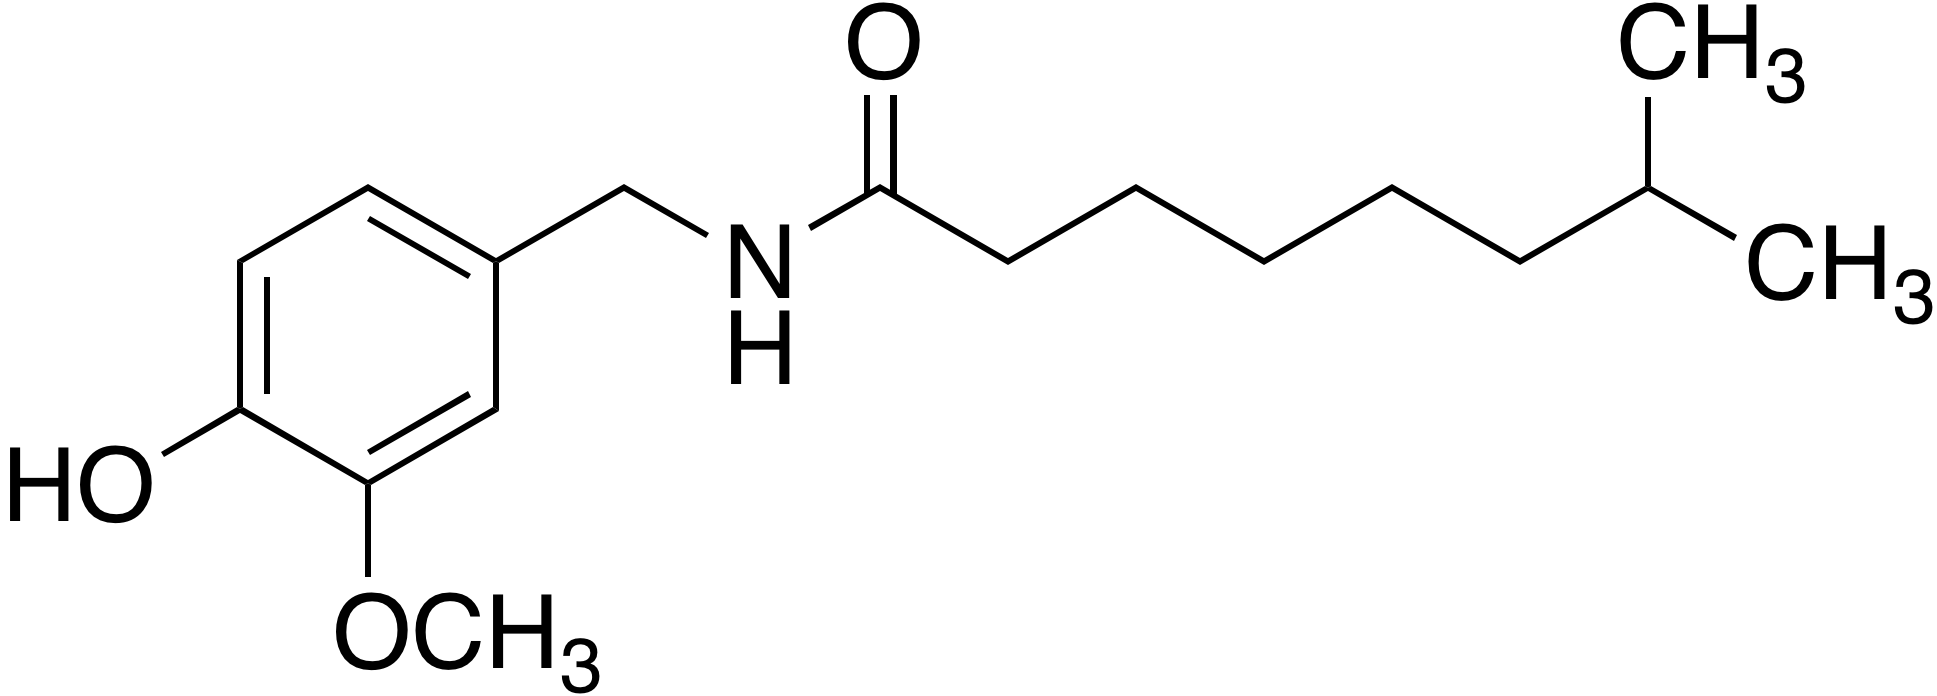 Nordihydrocapsaicin